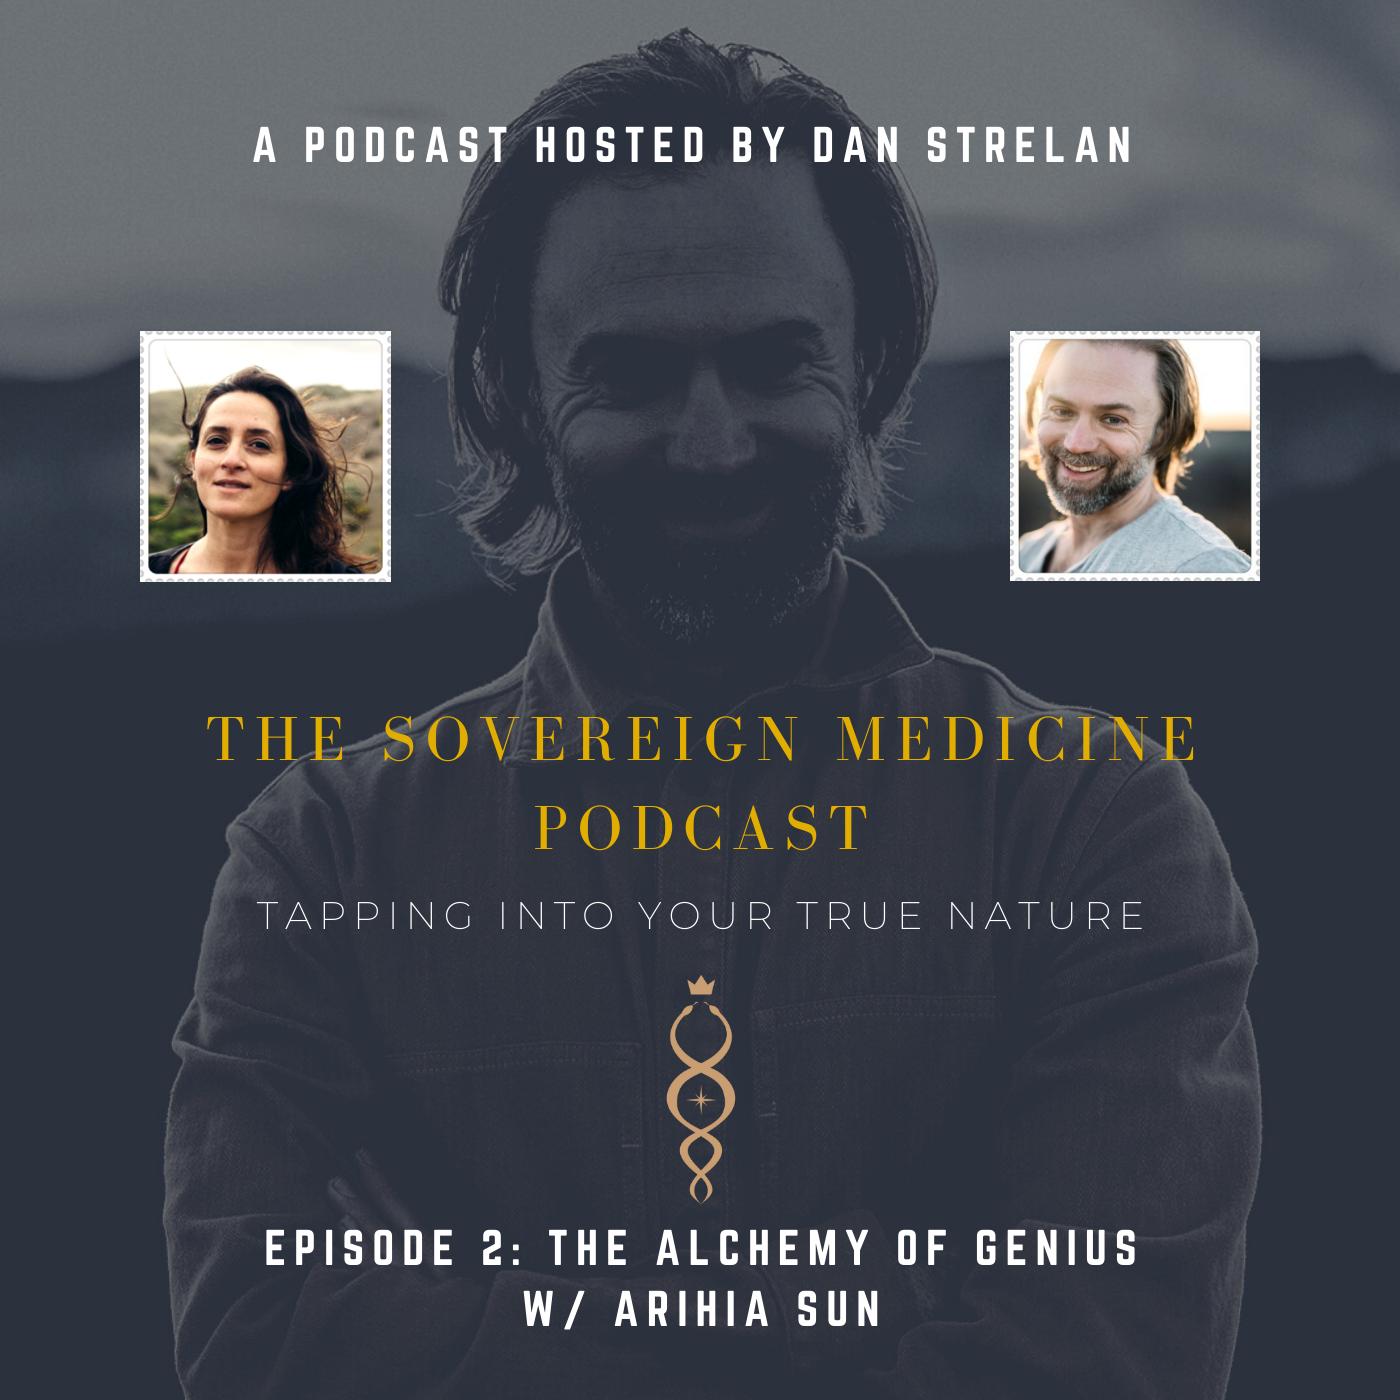 Artwork for podcast The Sovereign Medicine Podcast